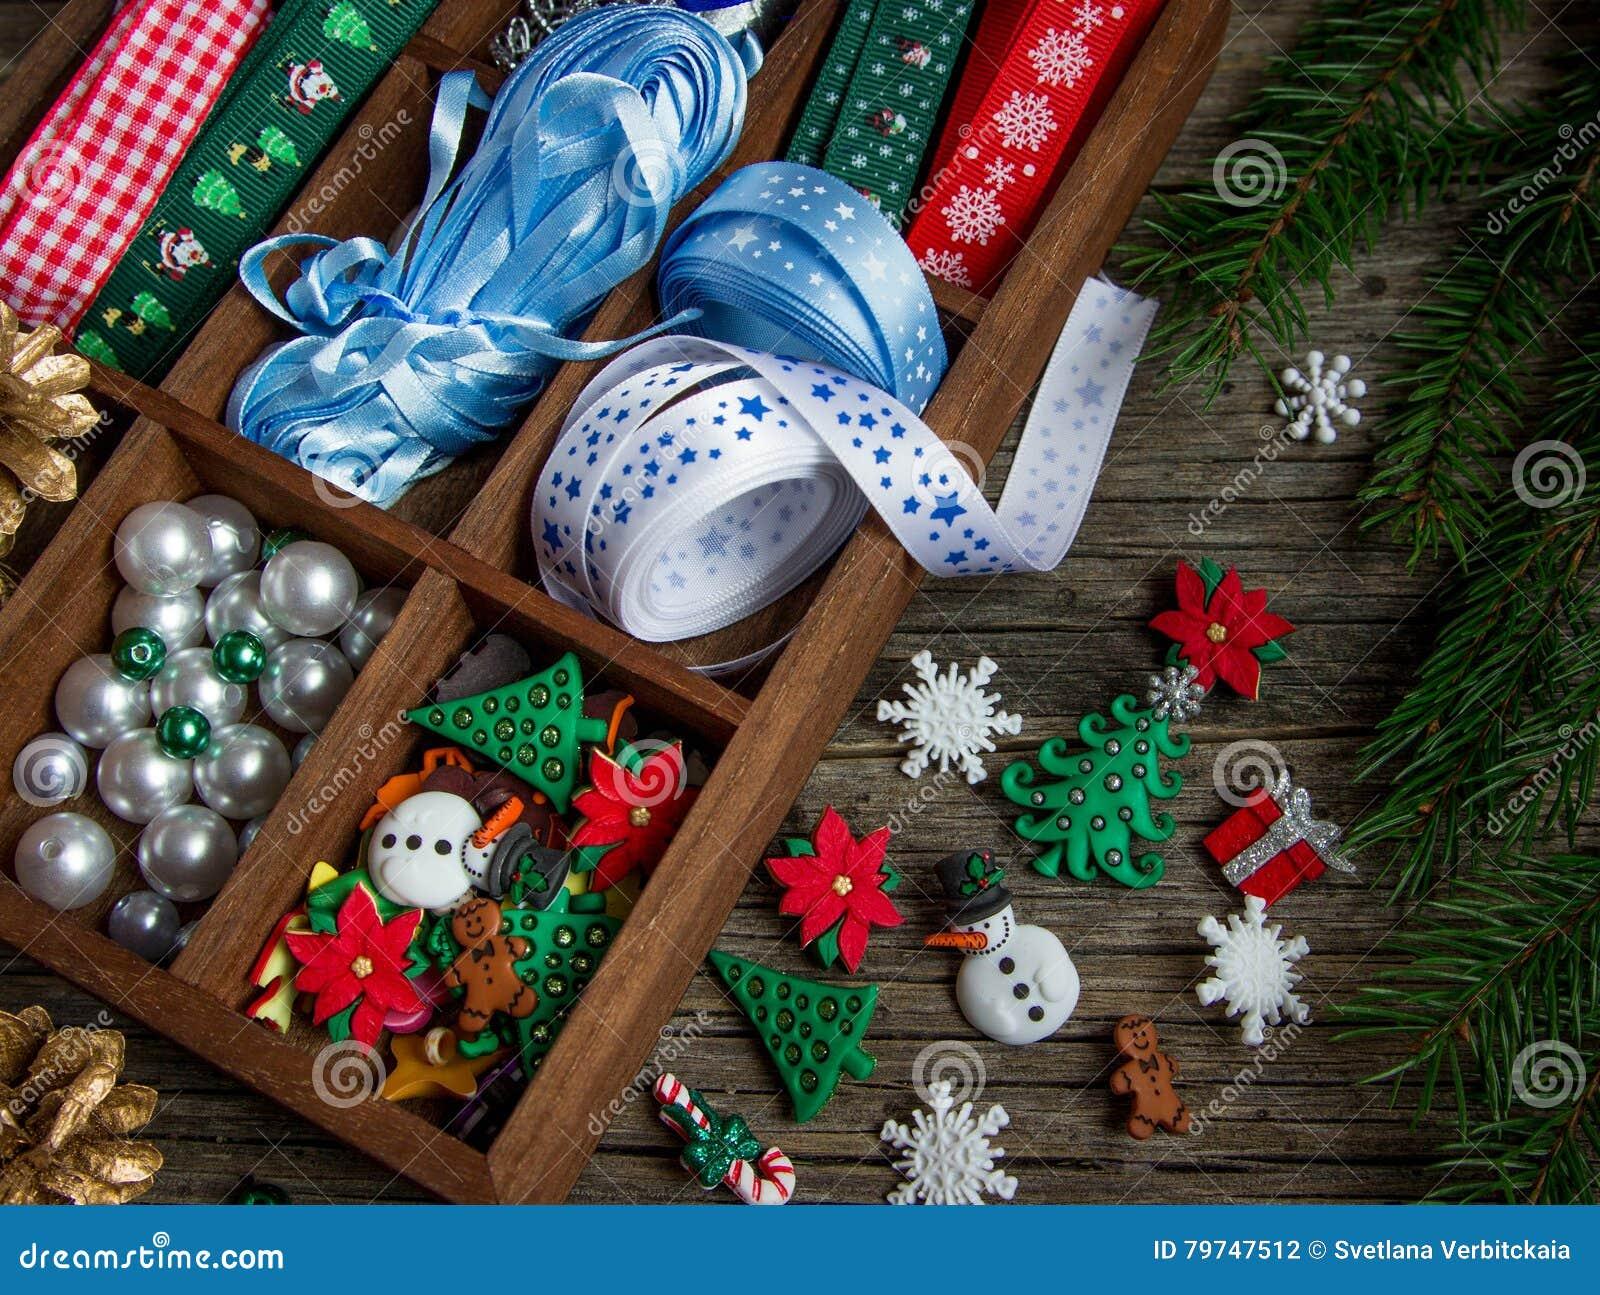 Cintas, gotas, juguetes, artes de la Navidad en una caja de madera